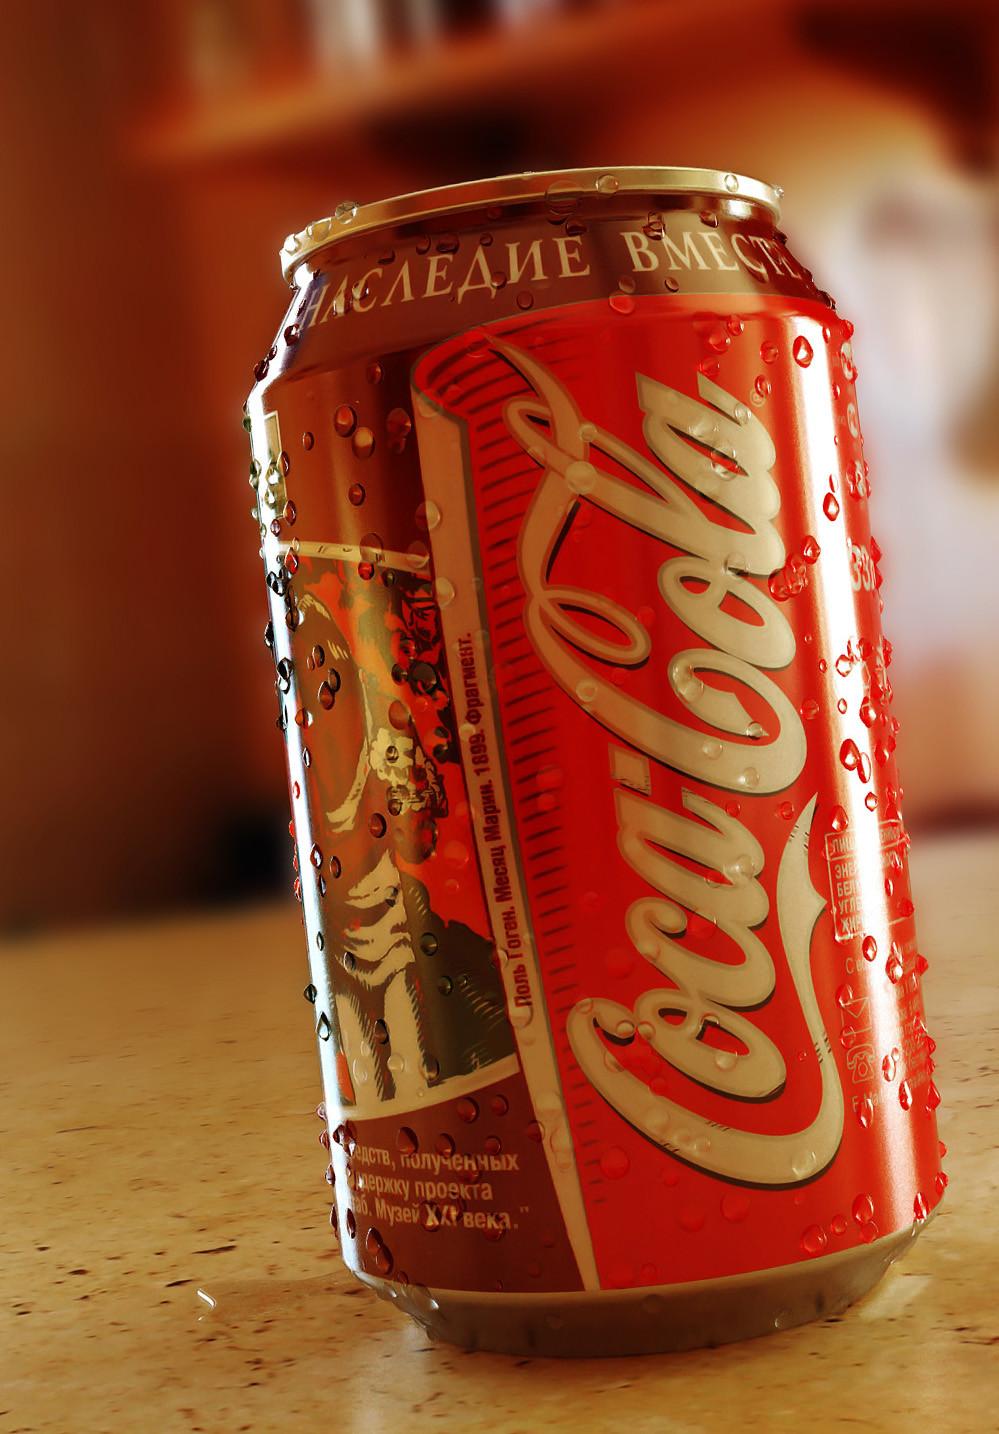 Nail khusnutdinov cola hdri disp big 110001 copy